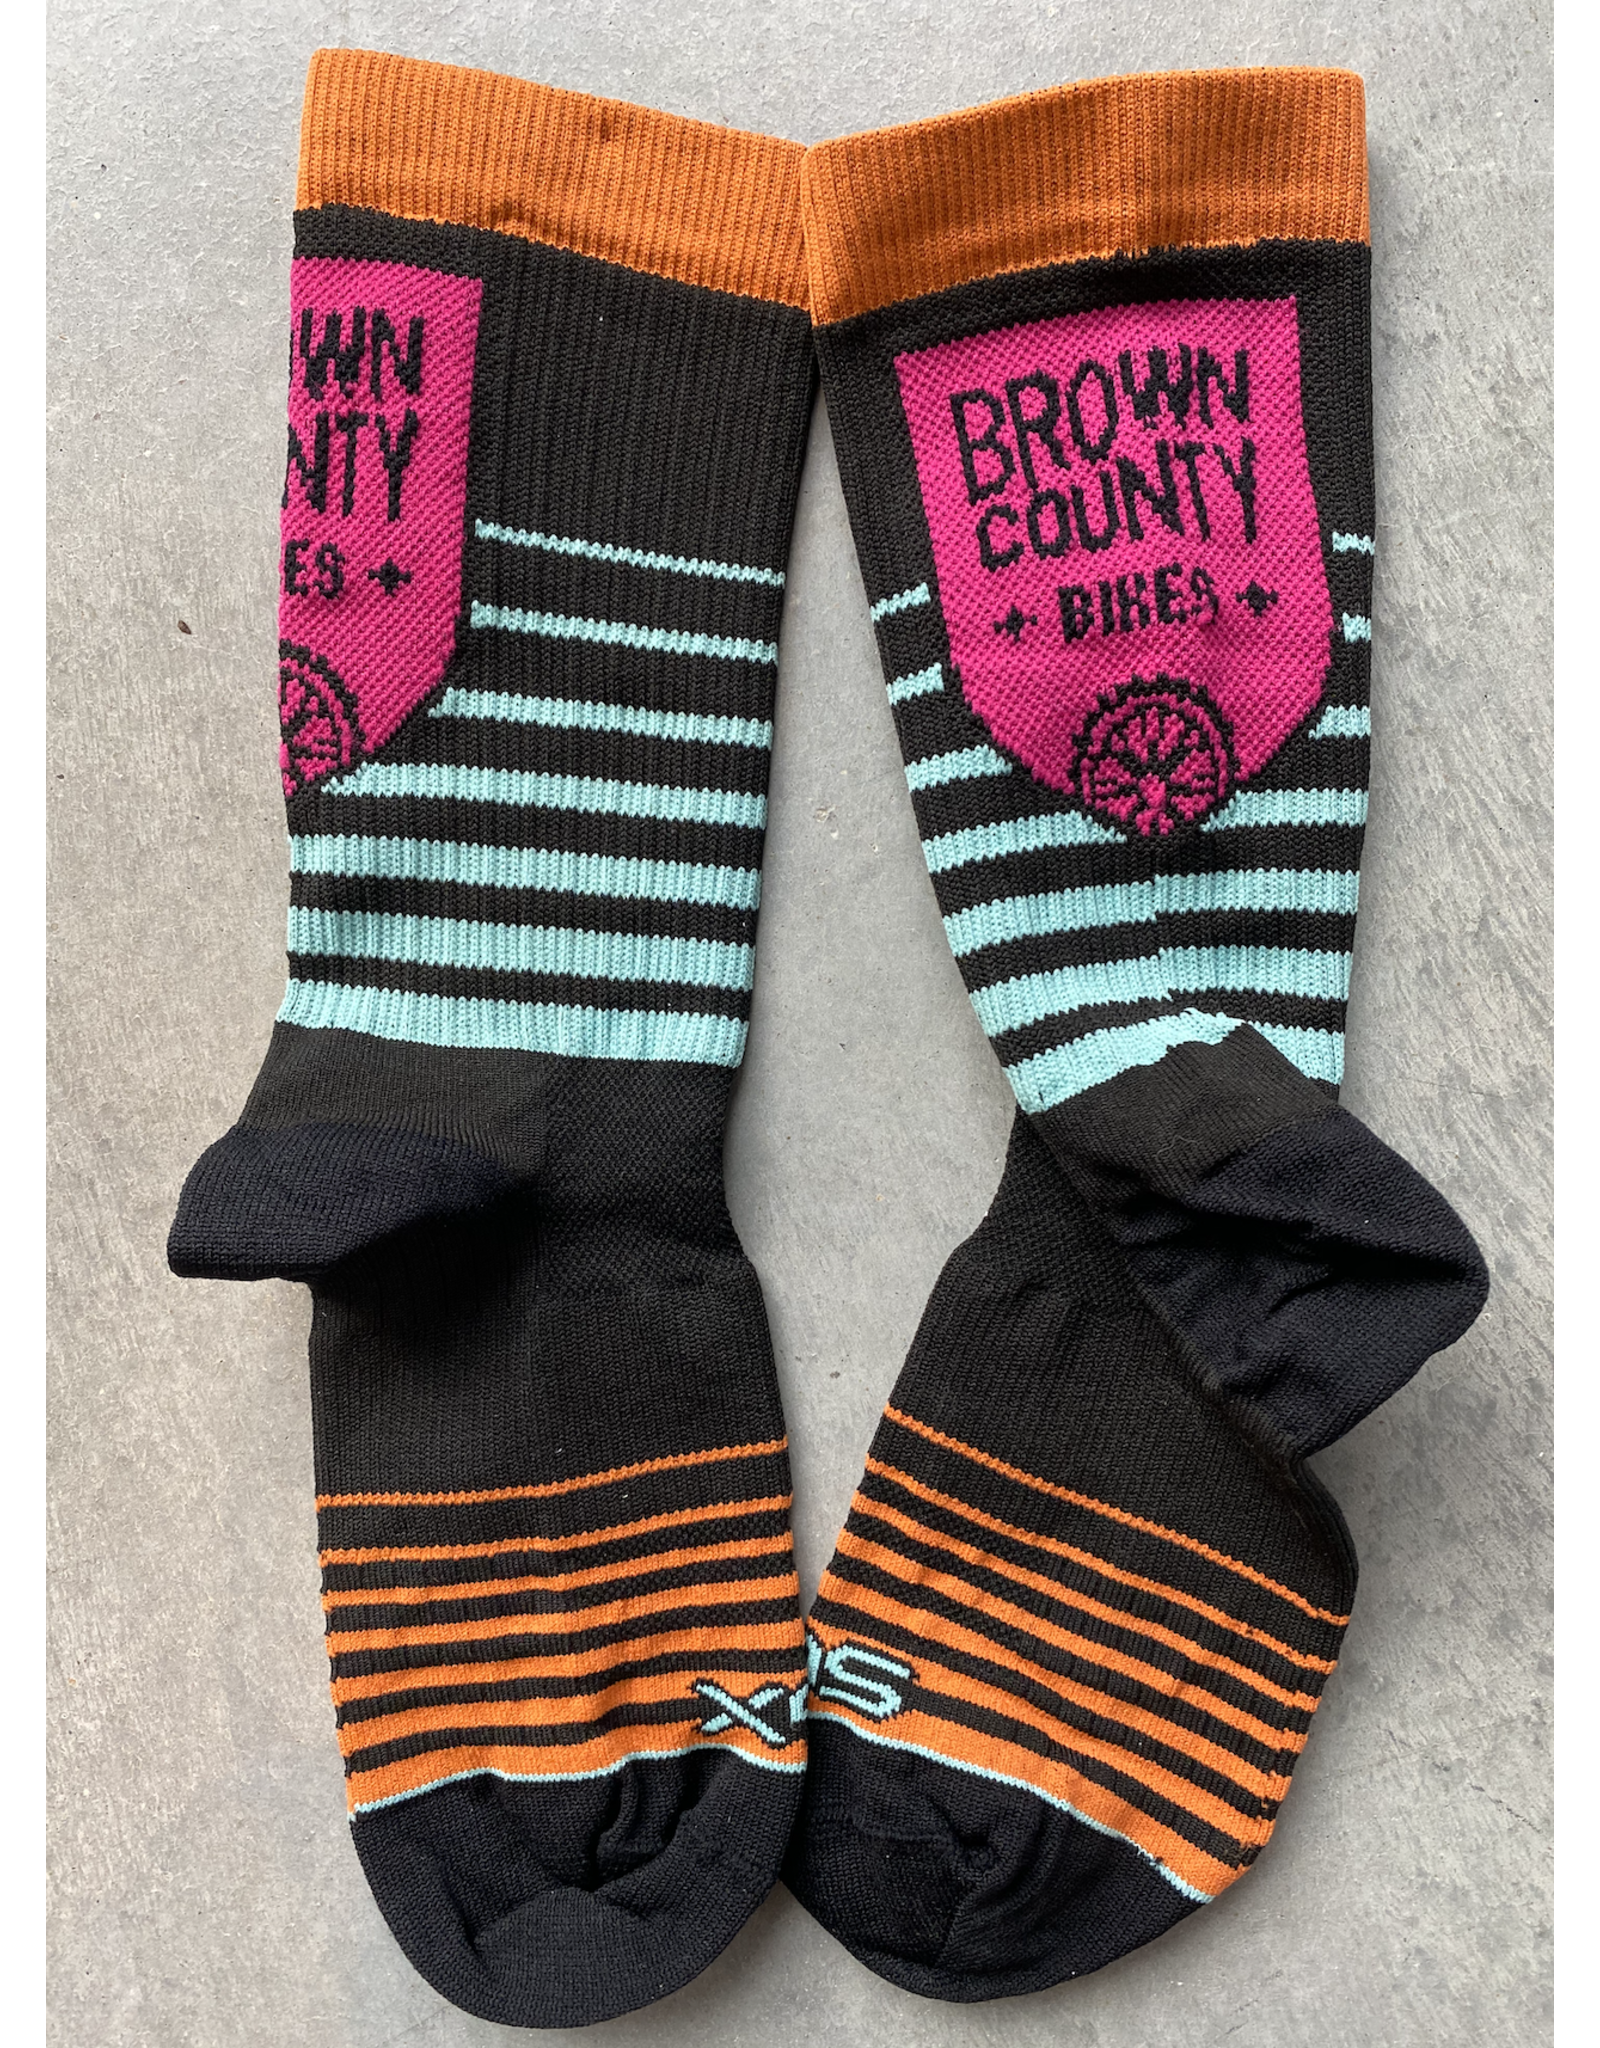 Sock Guy Brown County Bikes Socks SGX